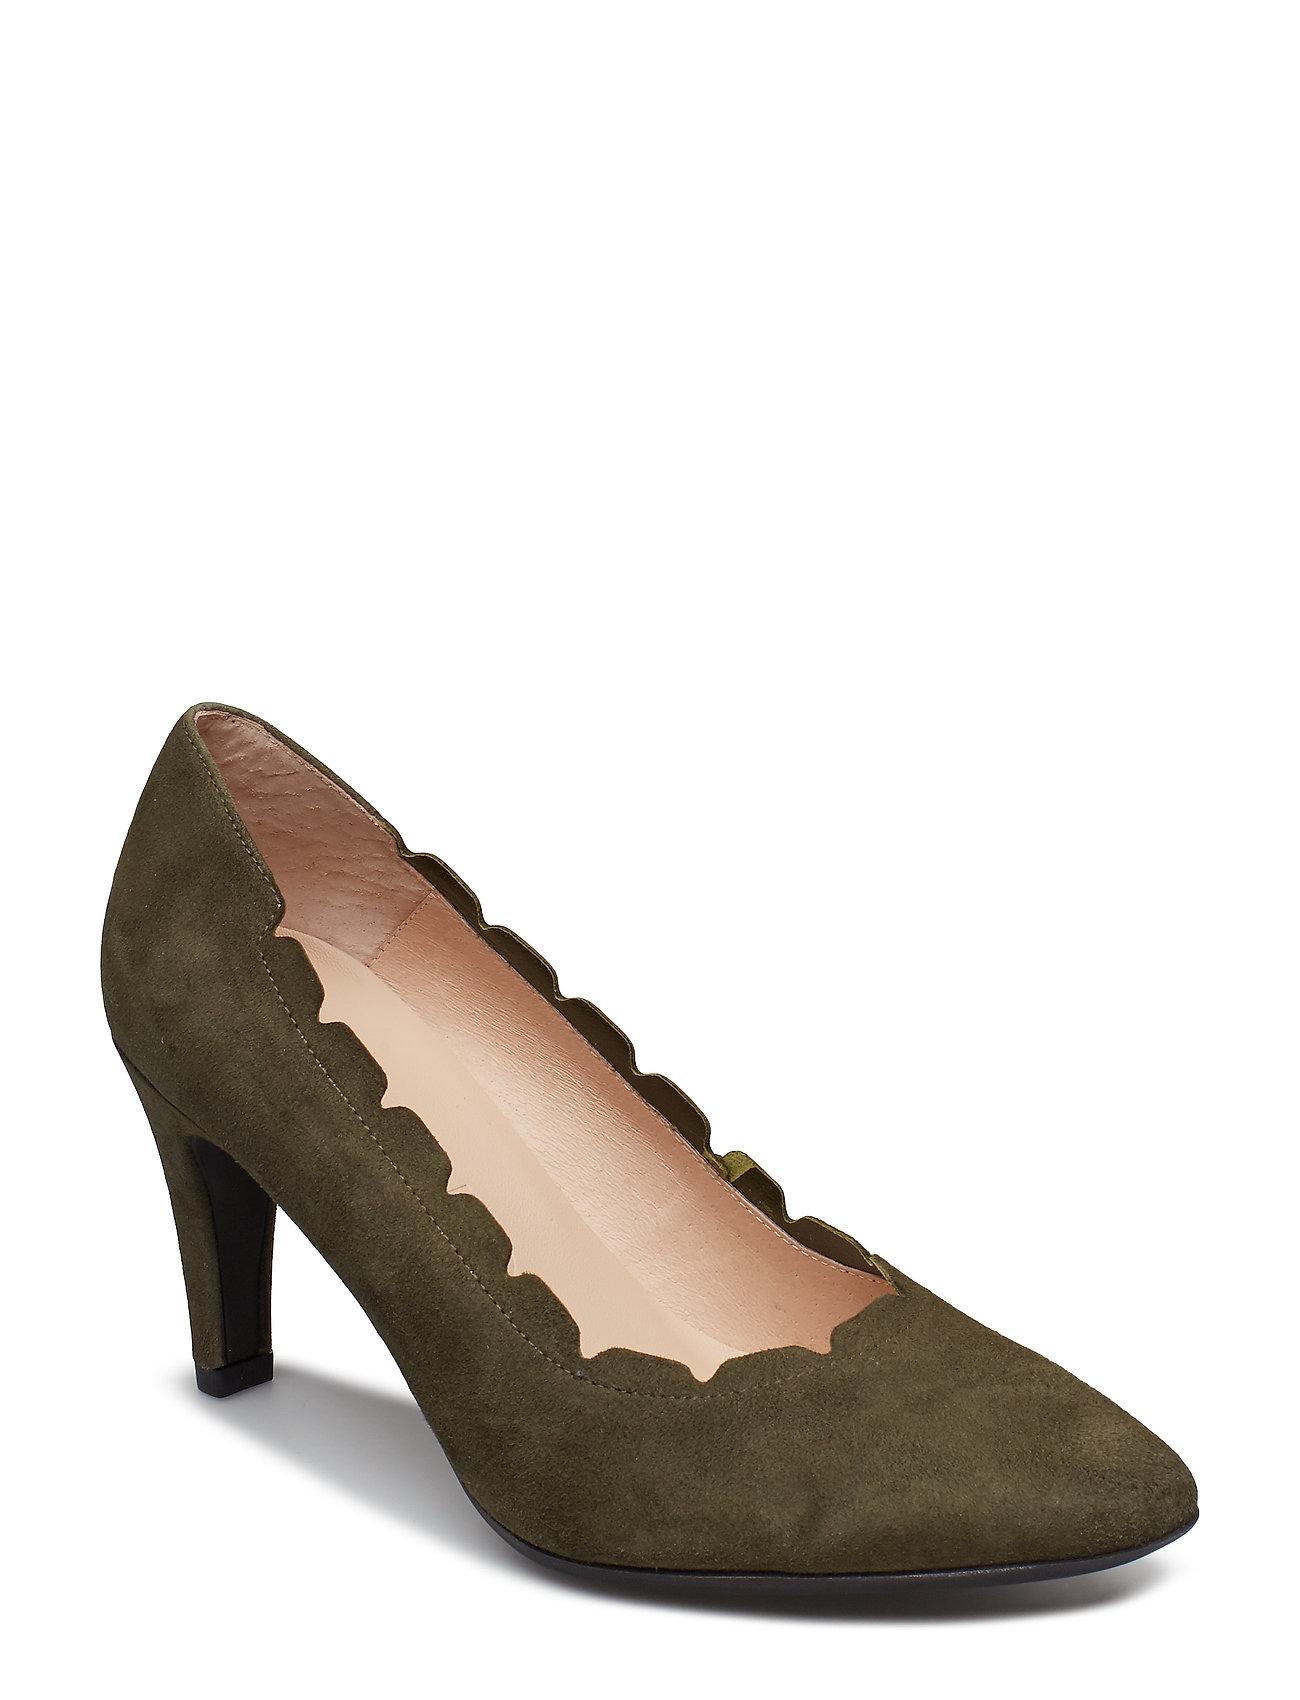 Image of M-2081 Shoes Heels Pumps Classic Grøn Wonders (3406174047)